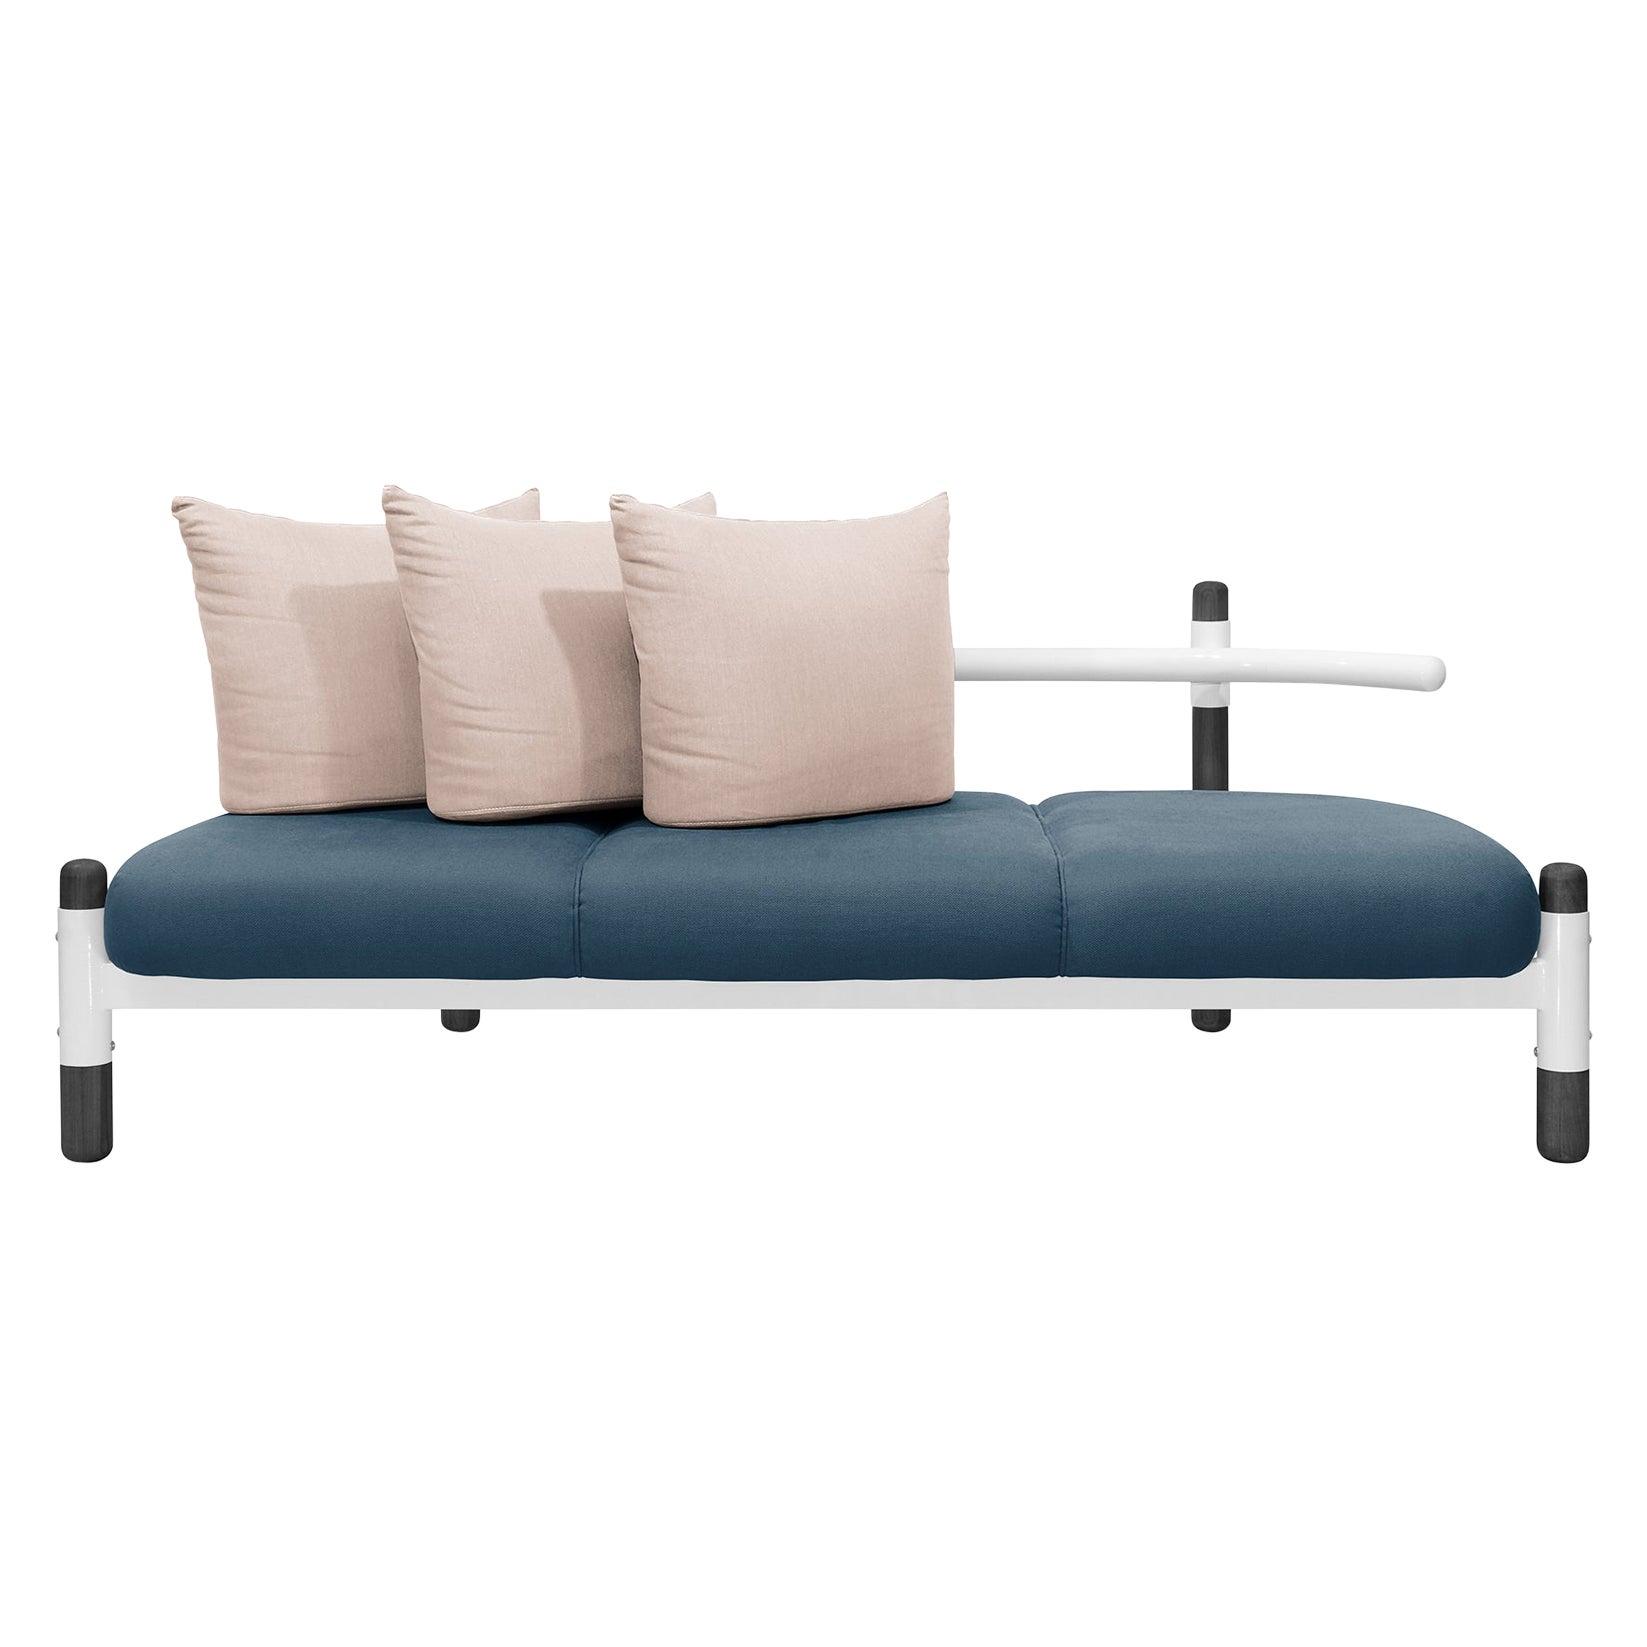 Blue PK15 Three-Seat Sofa, Steel Structure & Ebonized Wood Legs by Paulo Kobylka